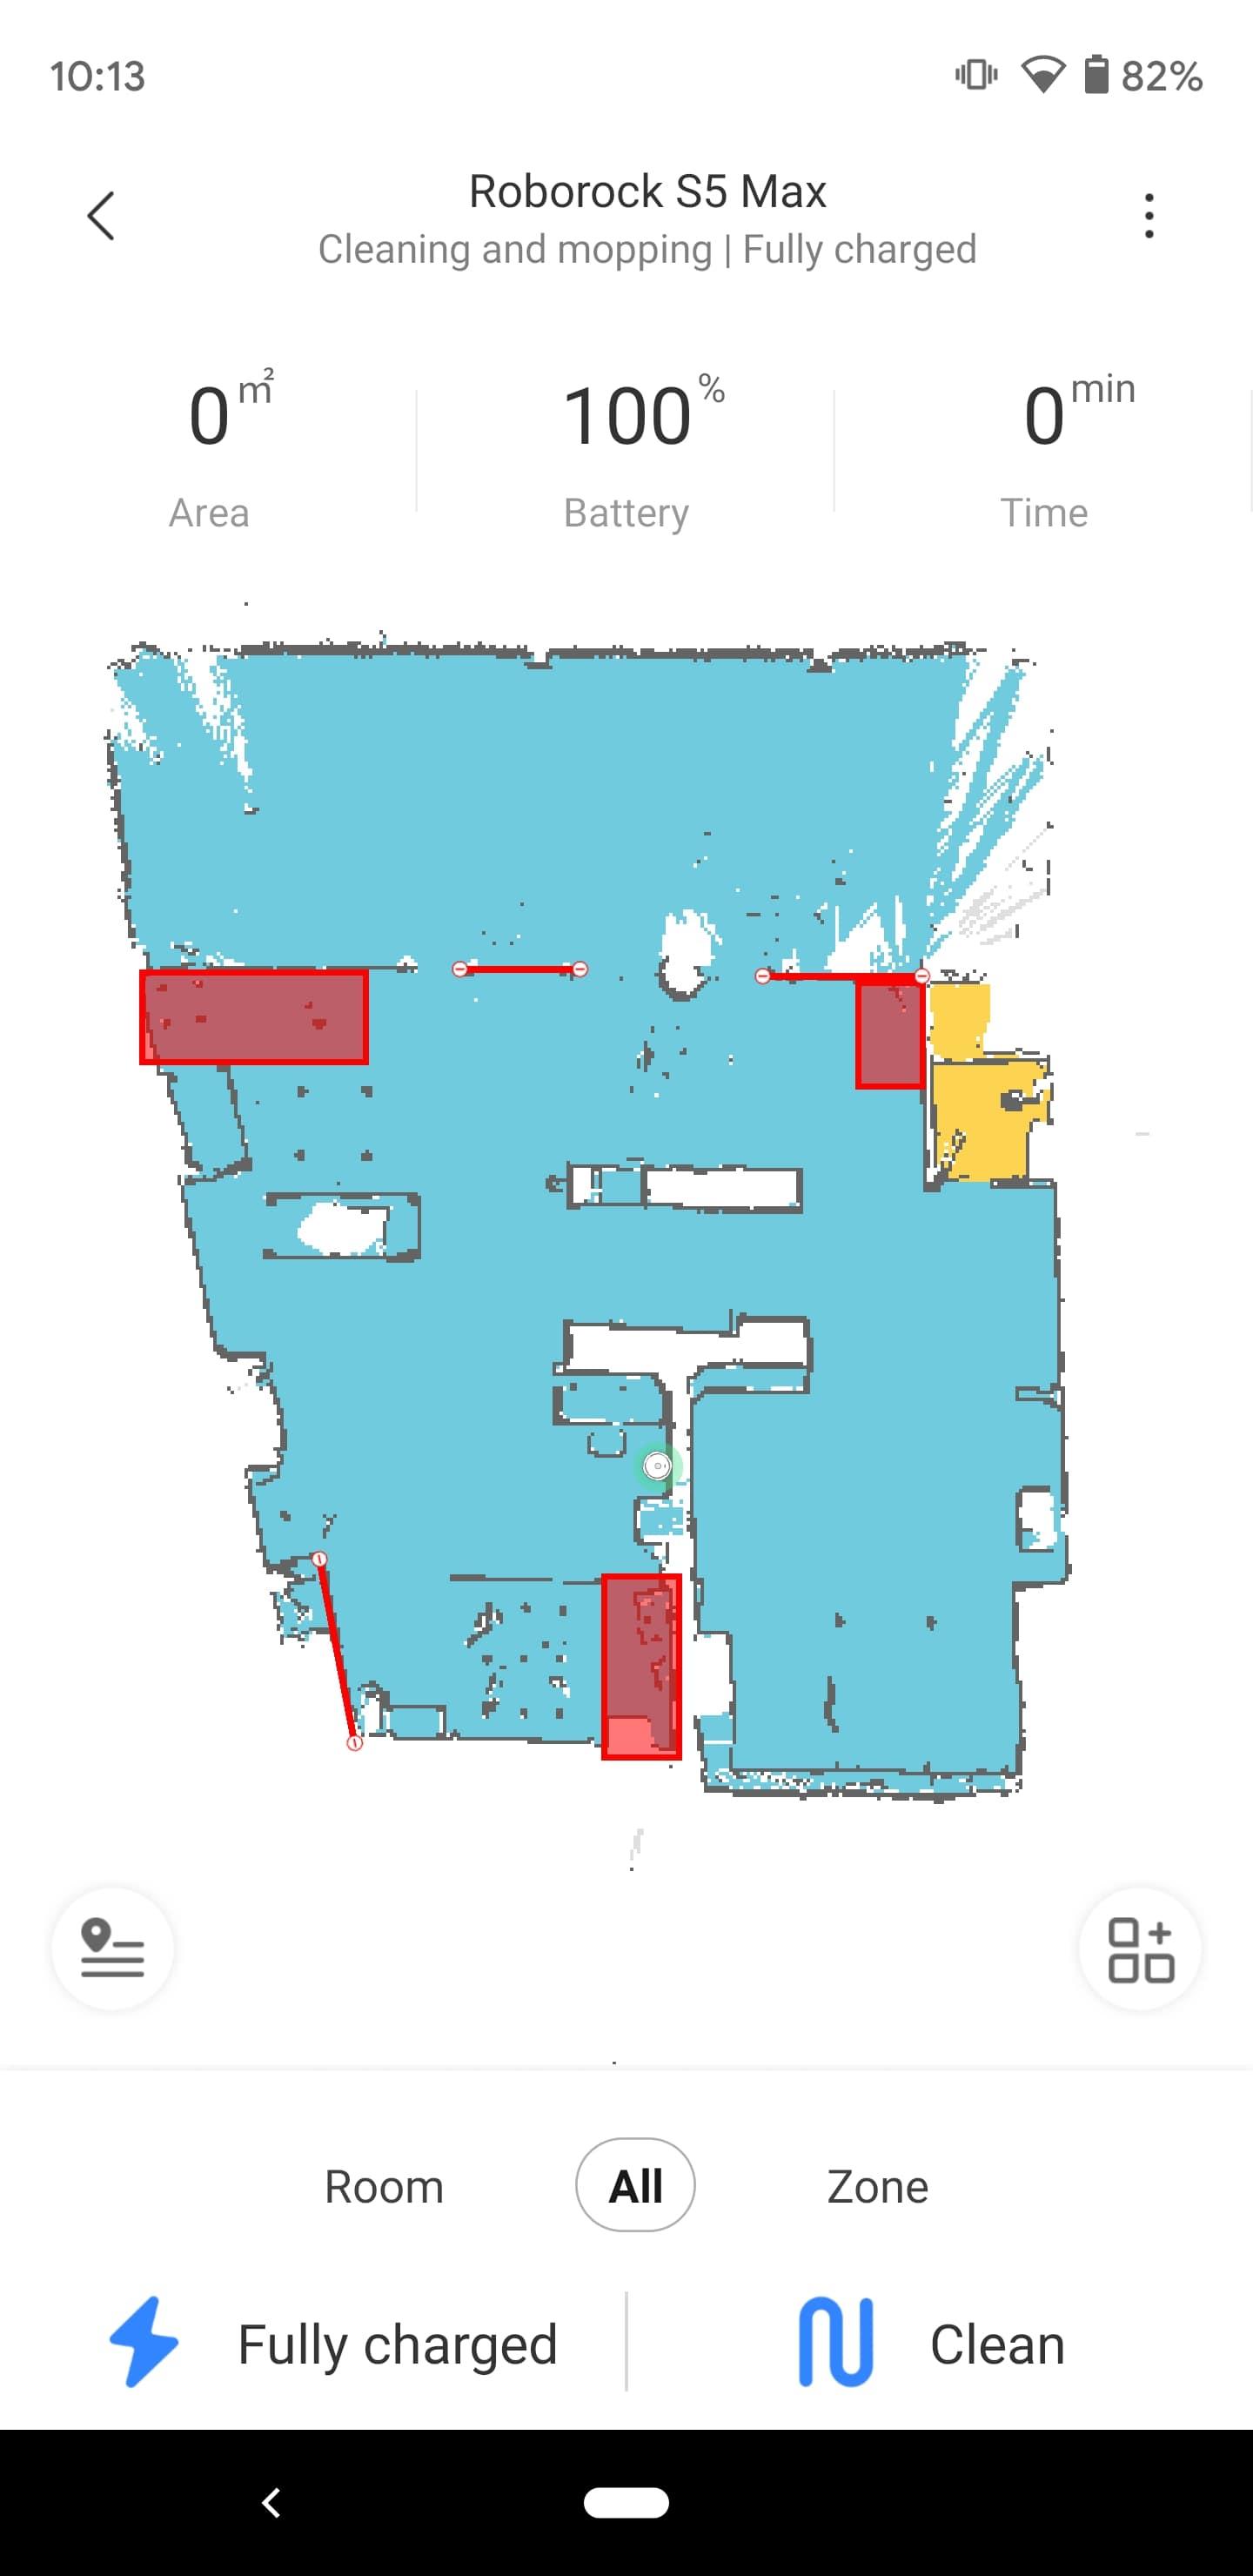 Roborock S5 Max Mi Home app map